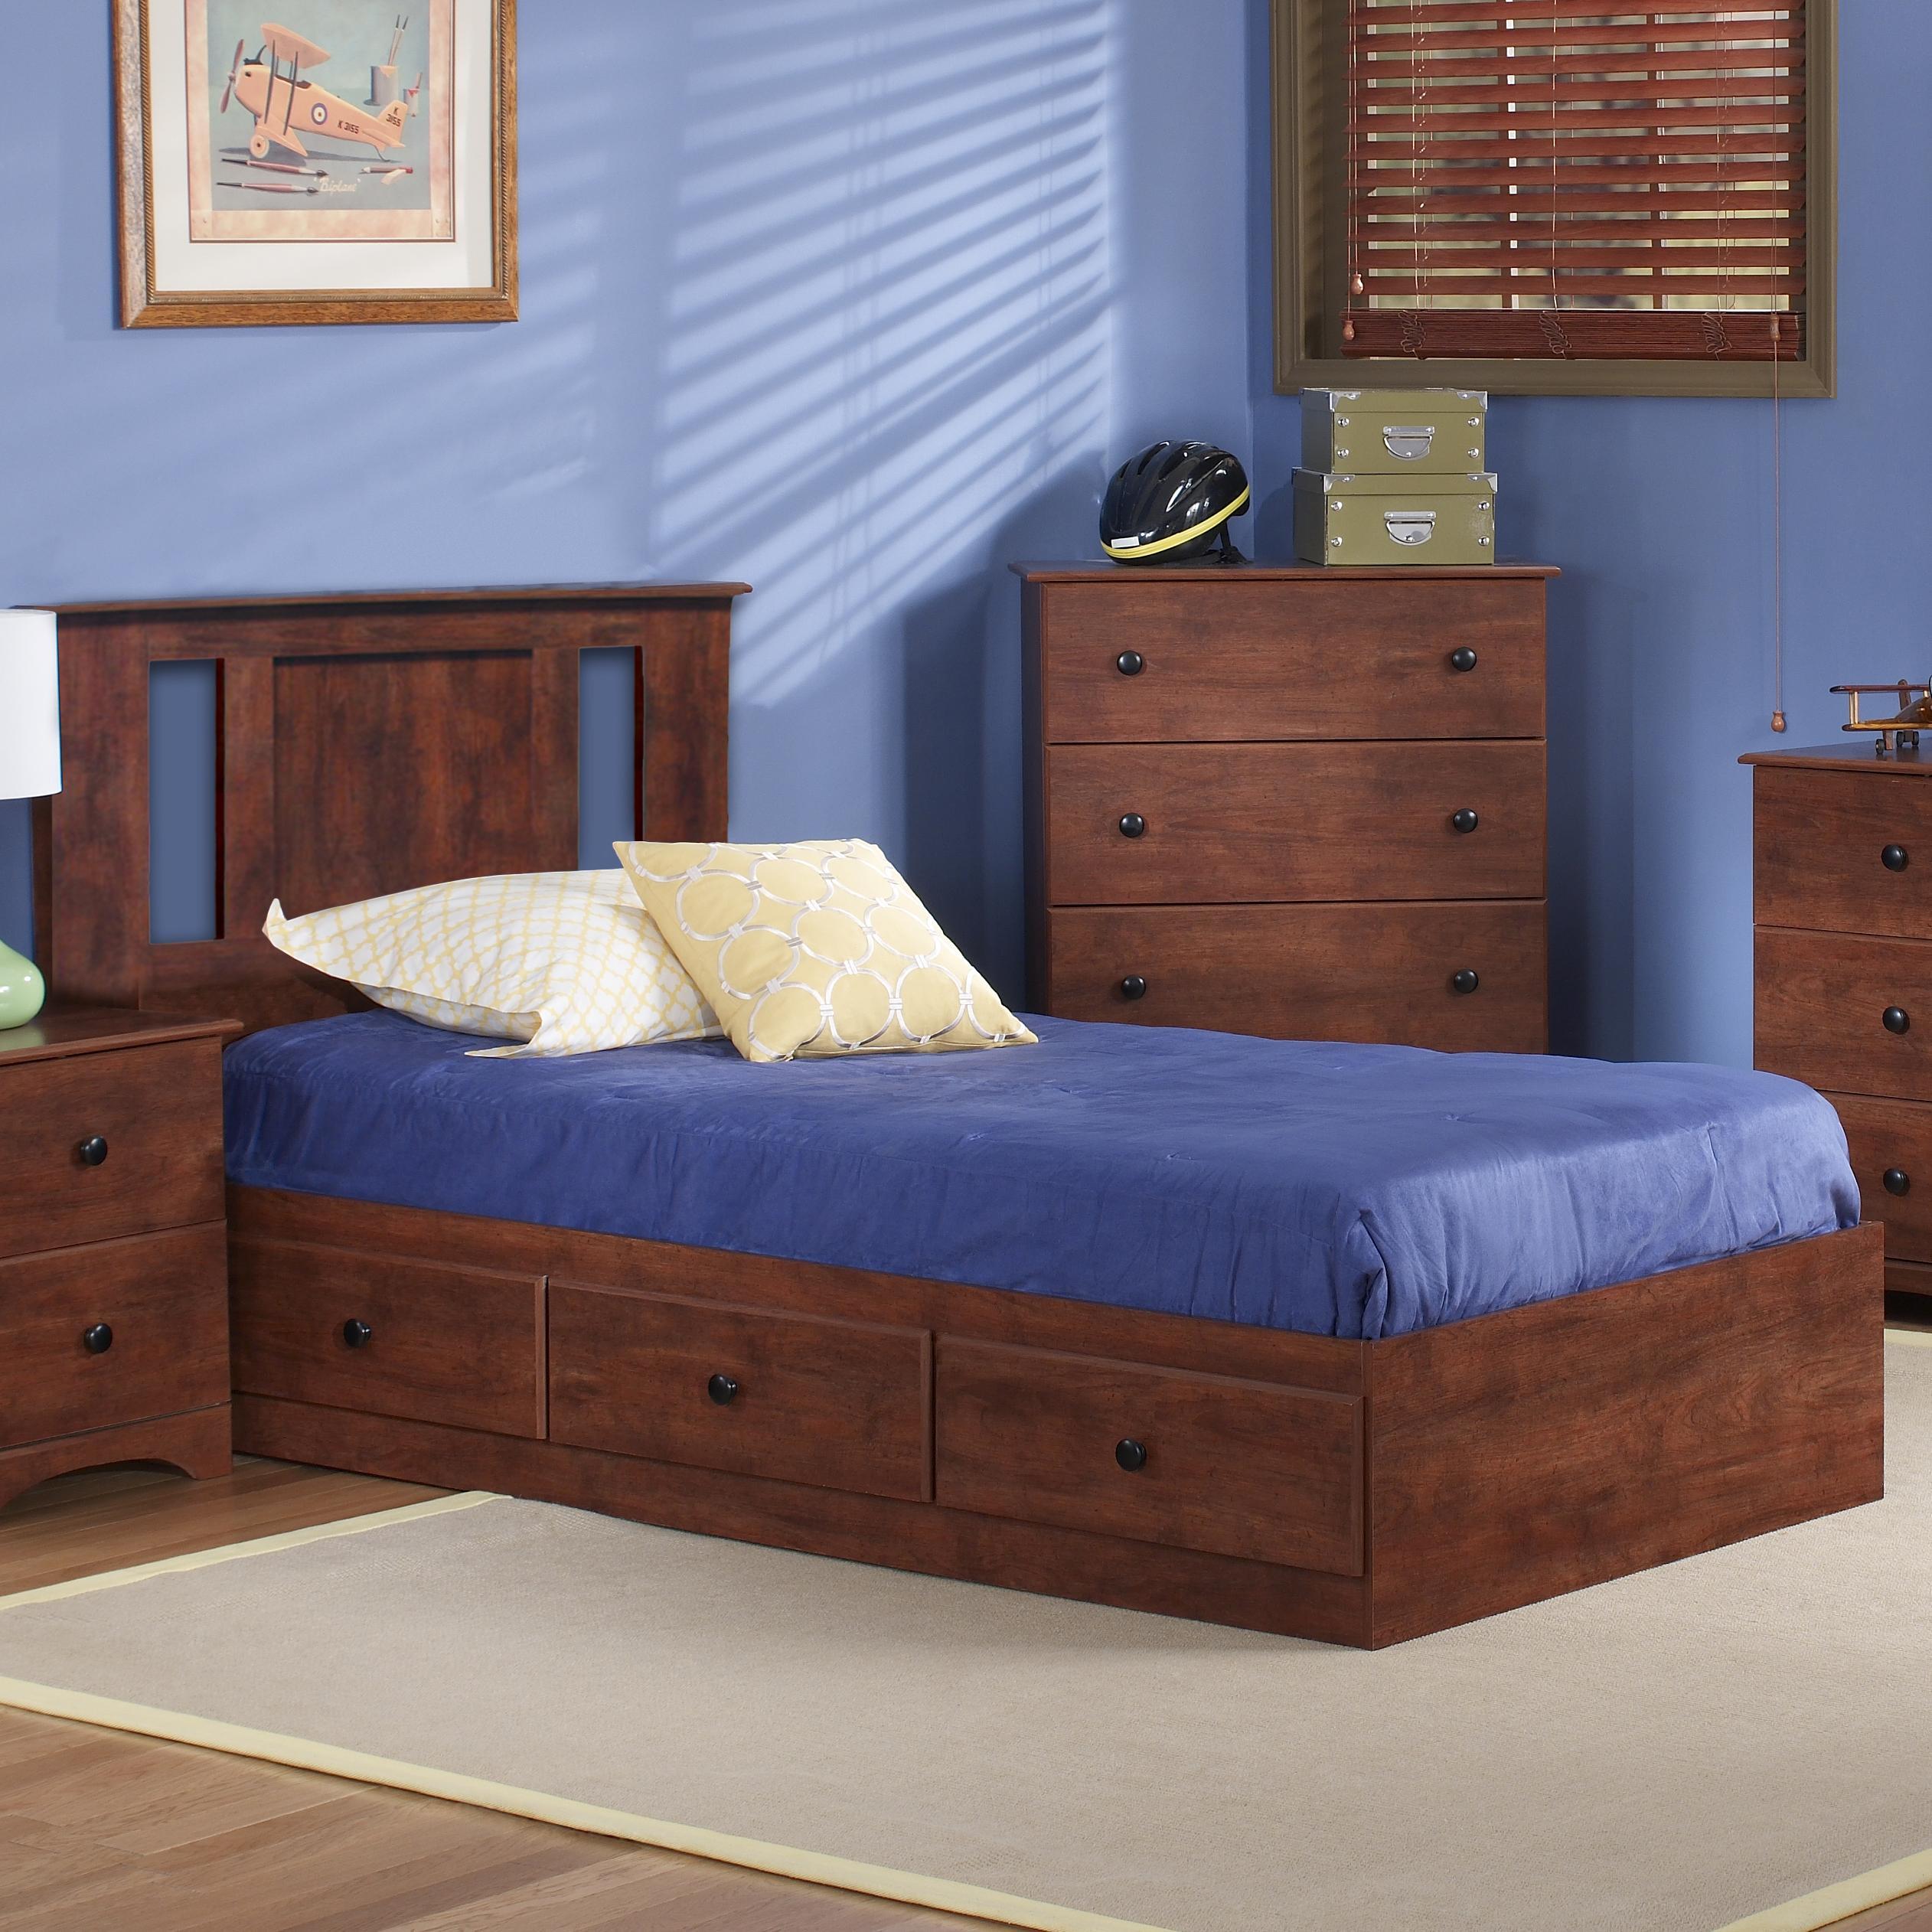 Full Panel Mates Bed